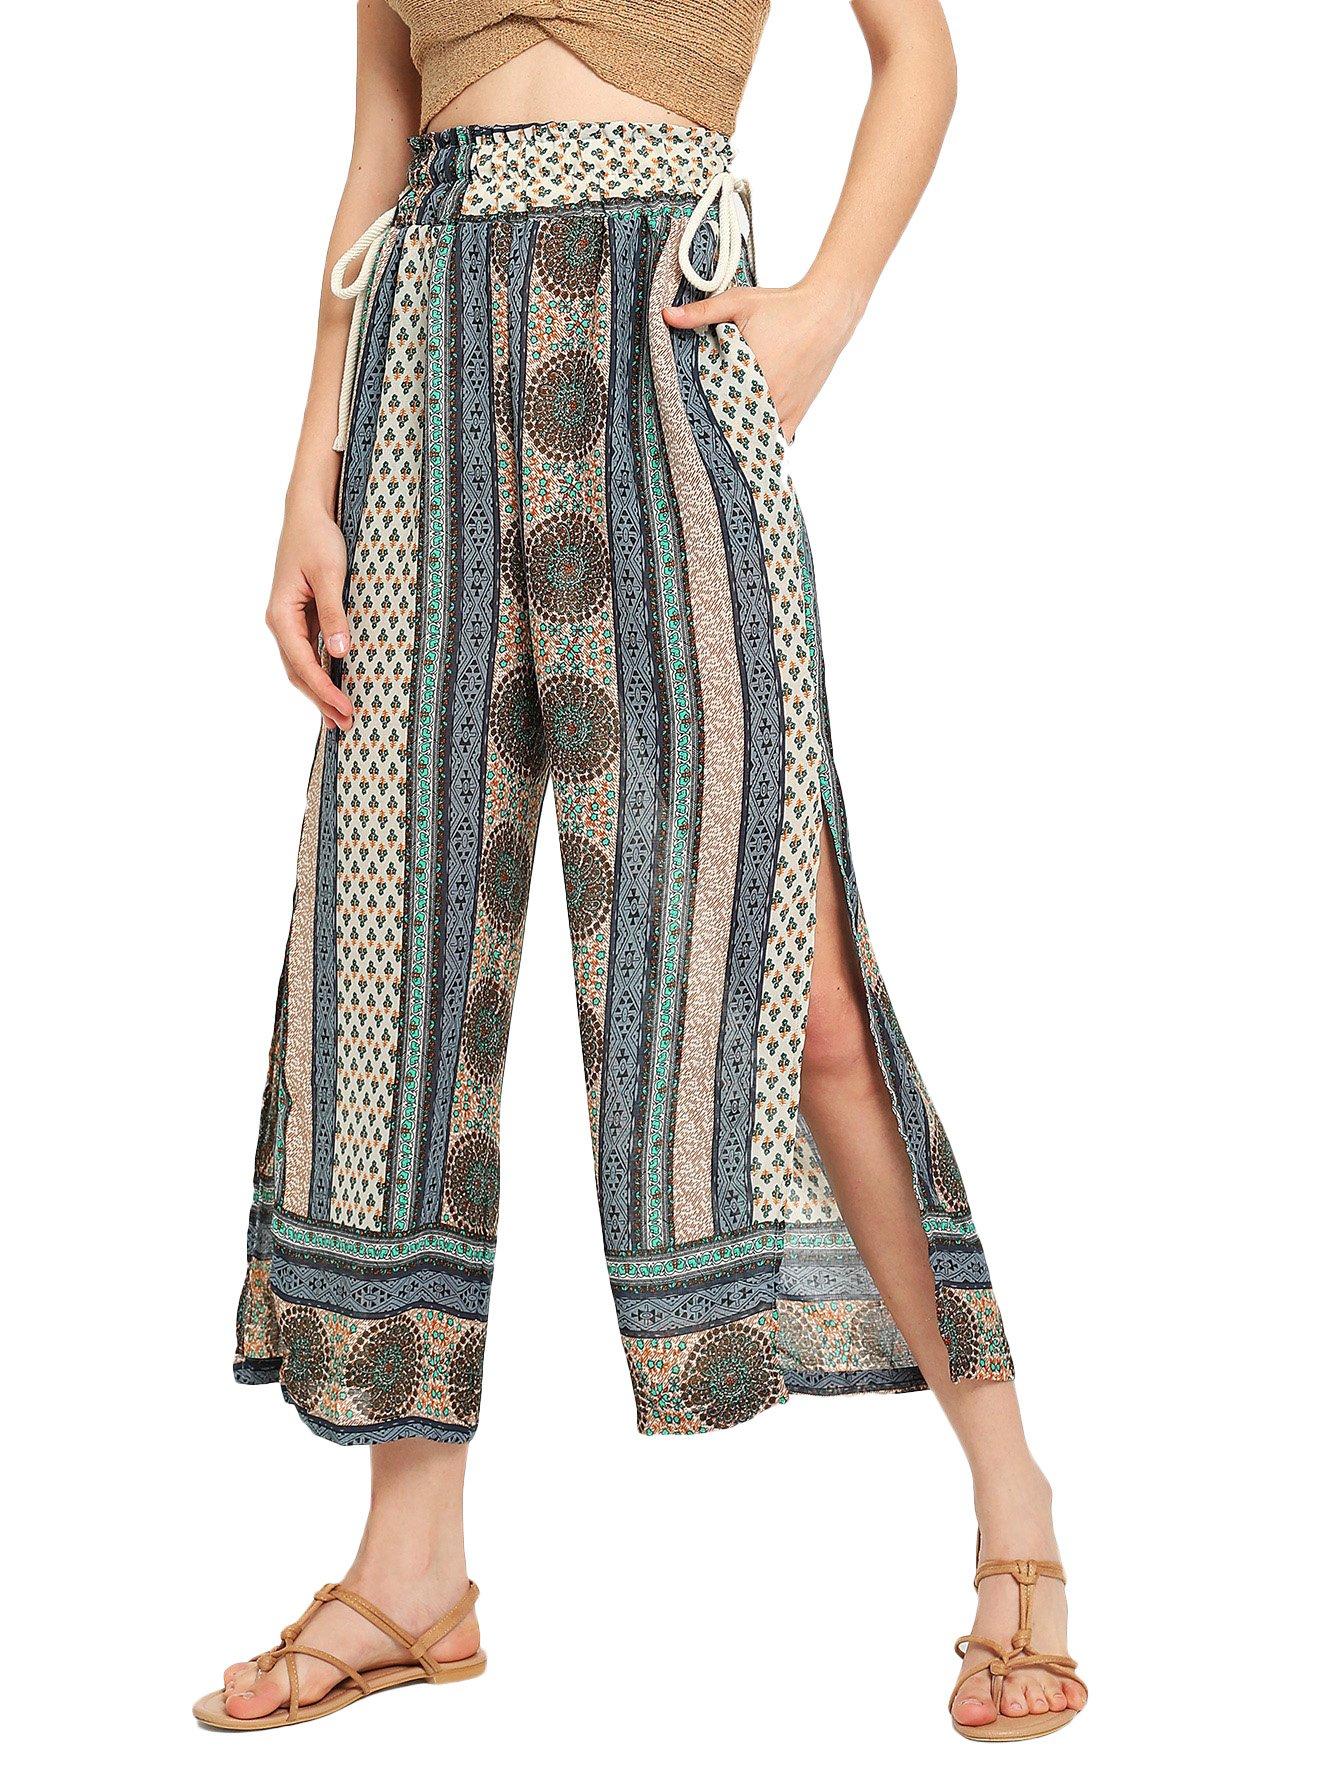 Romwe Women's Floral Frilled High Elastic Waist Wide Leg Pants #Muliticolor XL